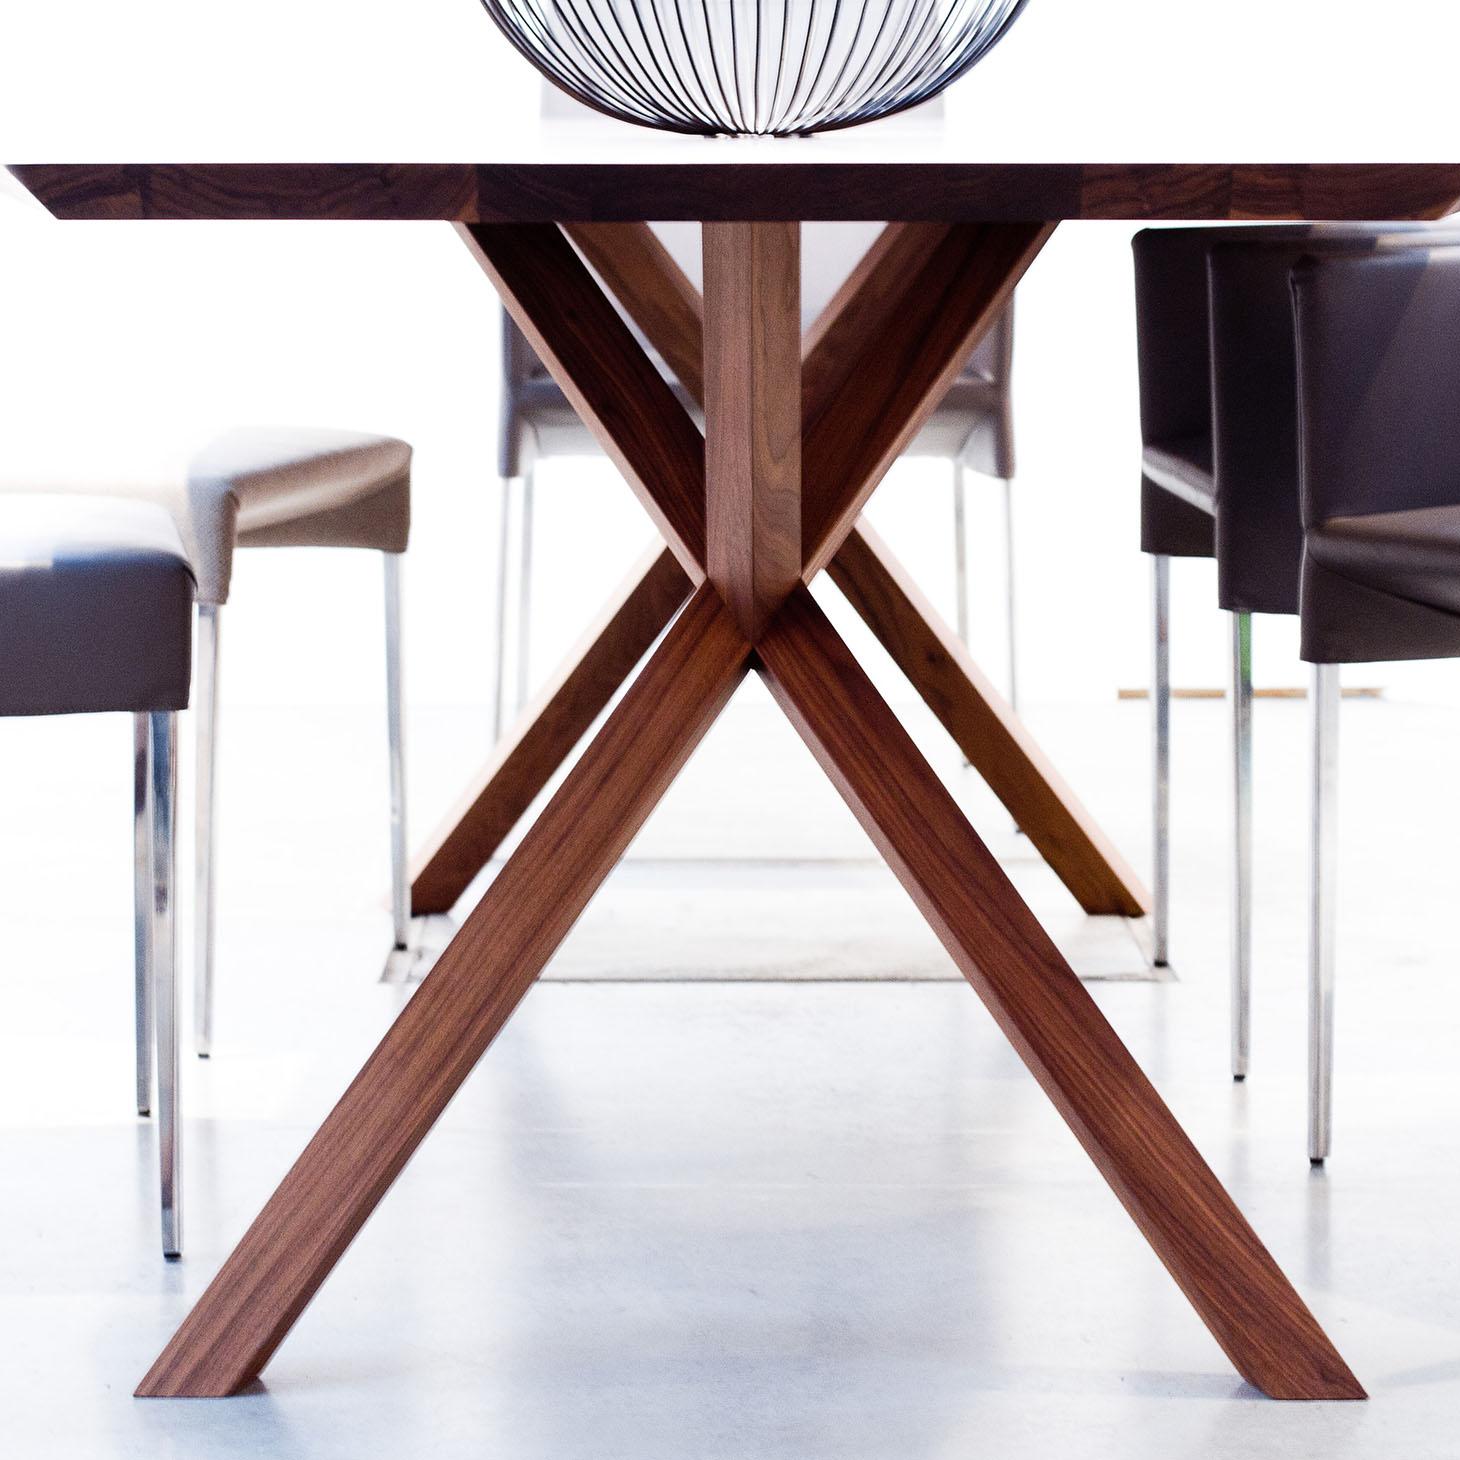 XY Table